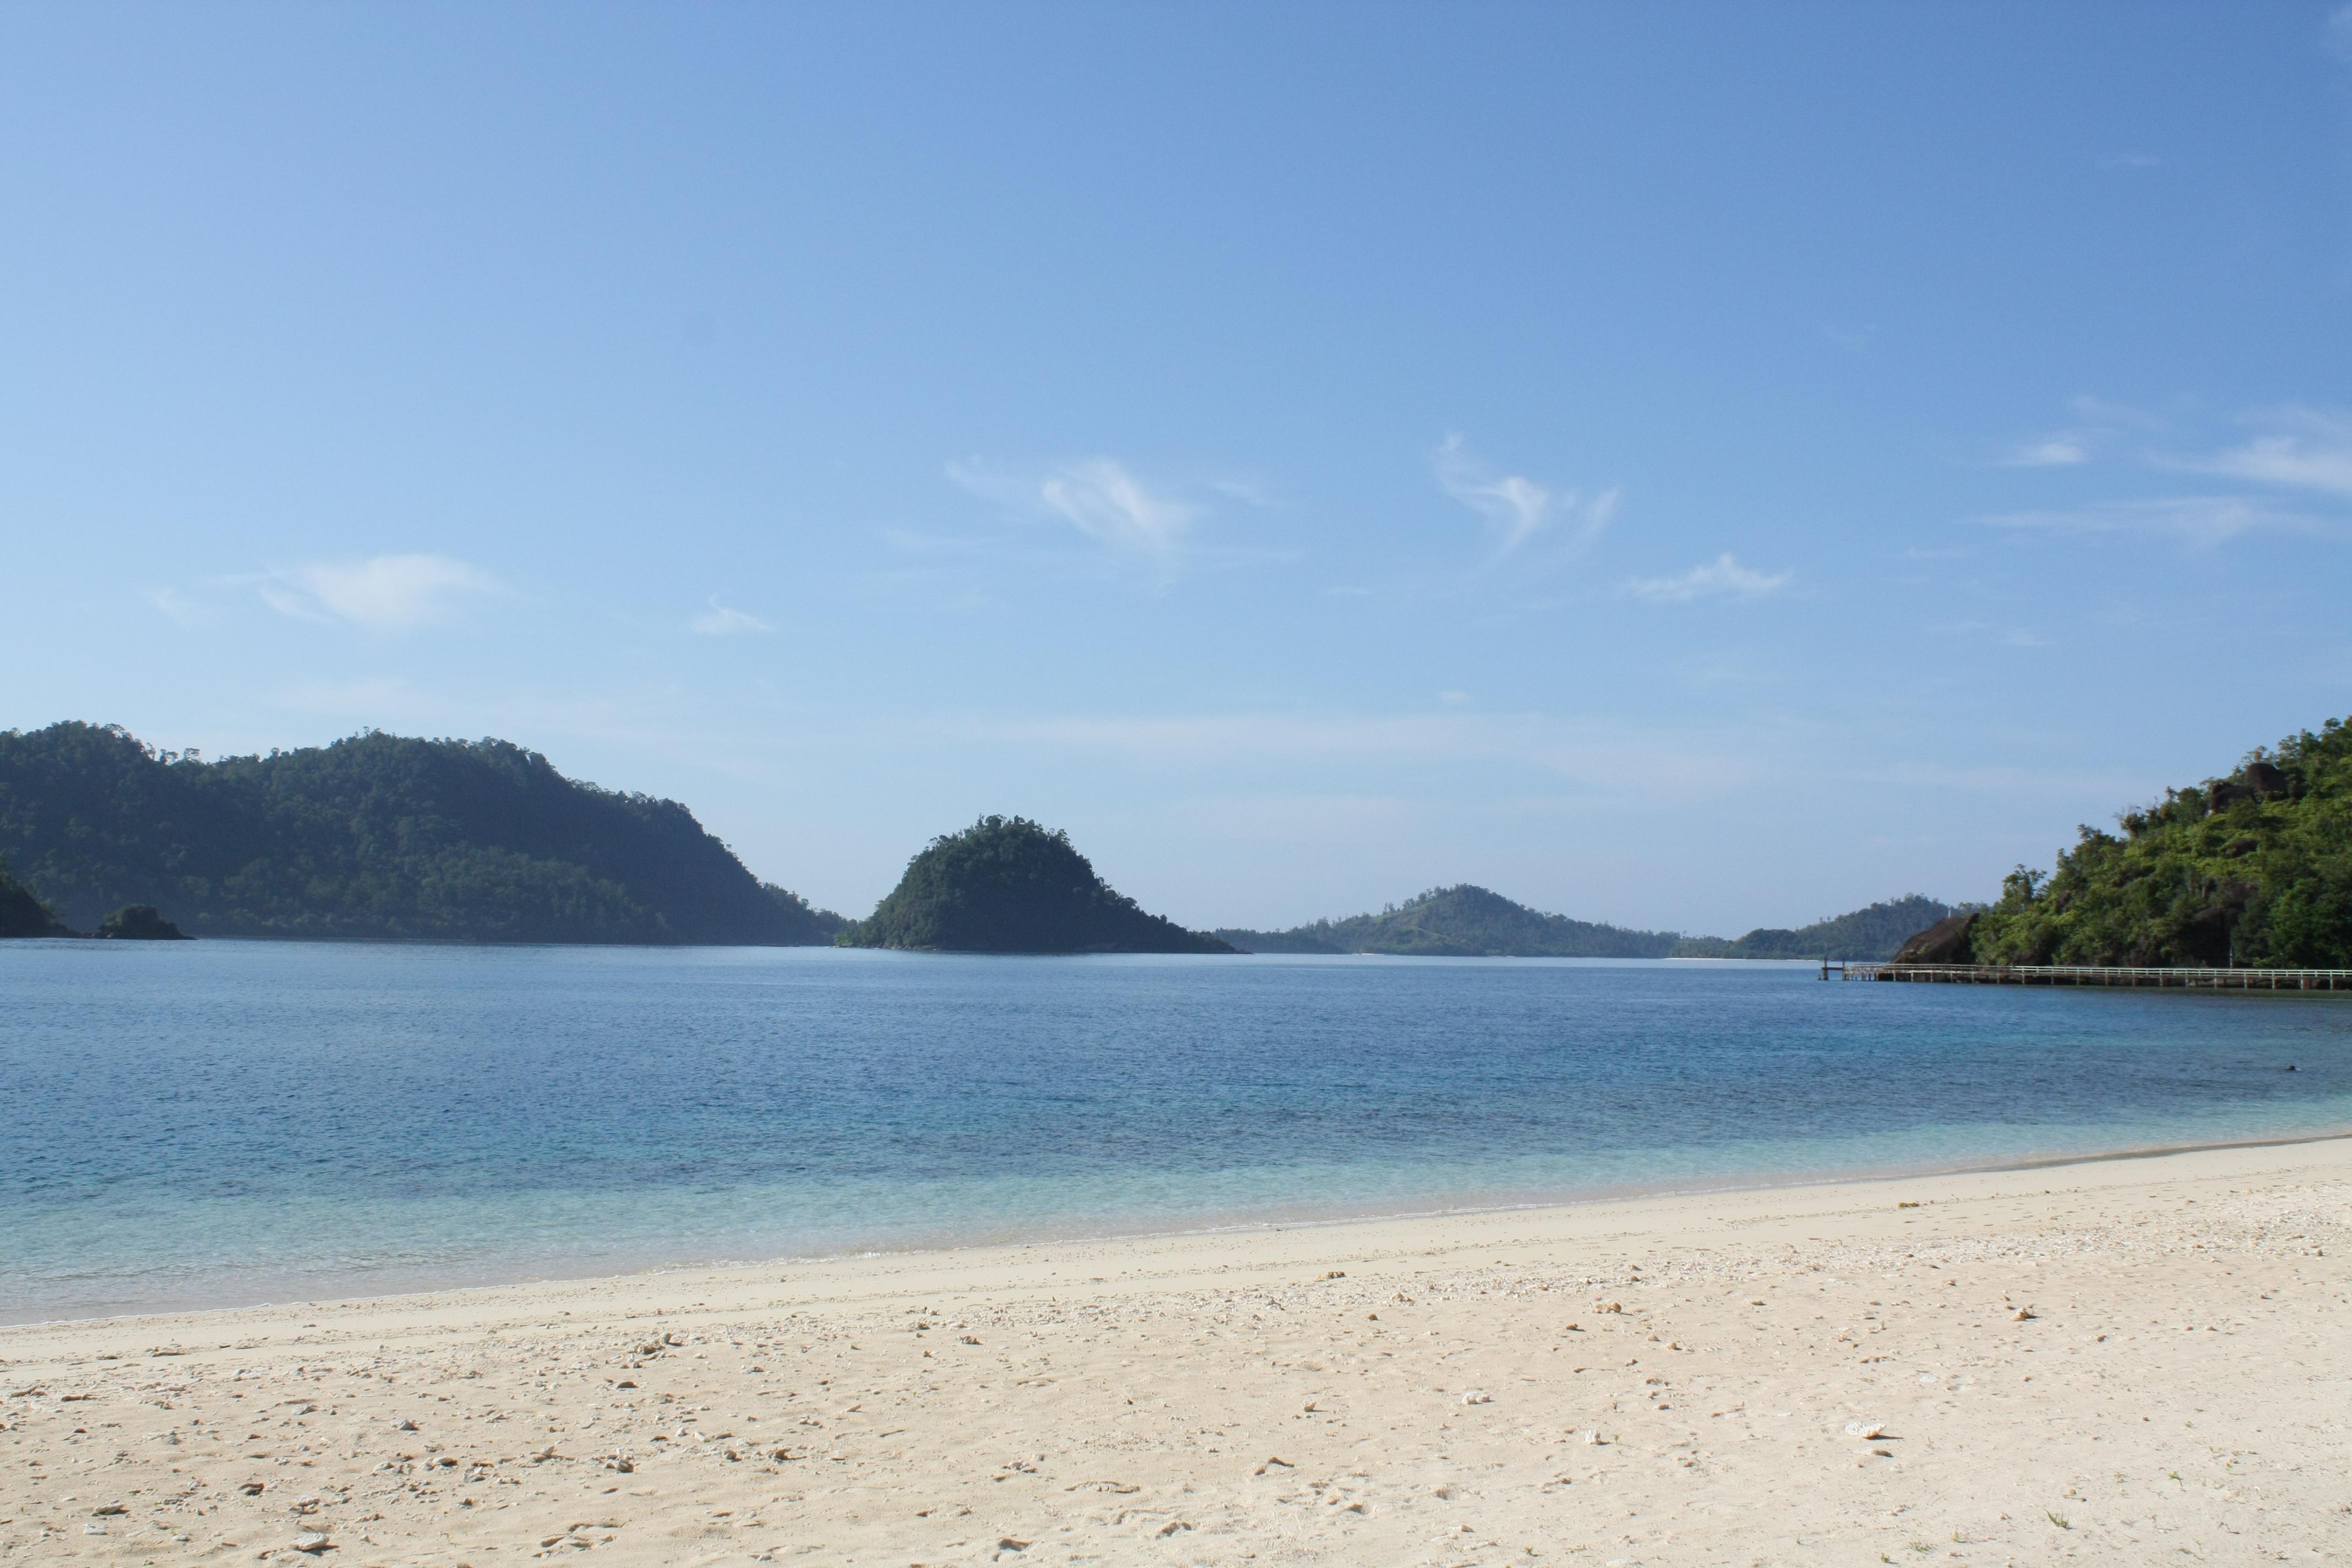 Objek Wisata Kalimantan Tengah Chaca Blog Mencapai Menyusuri Kawasan Pantai